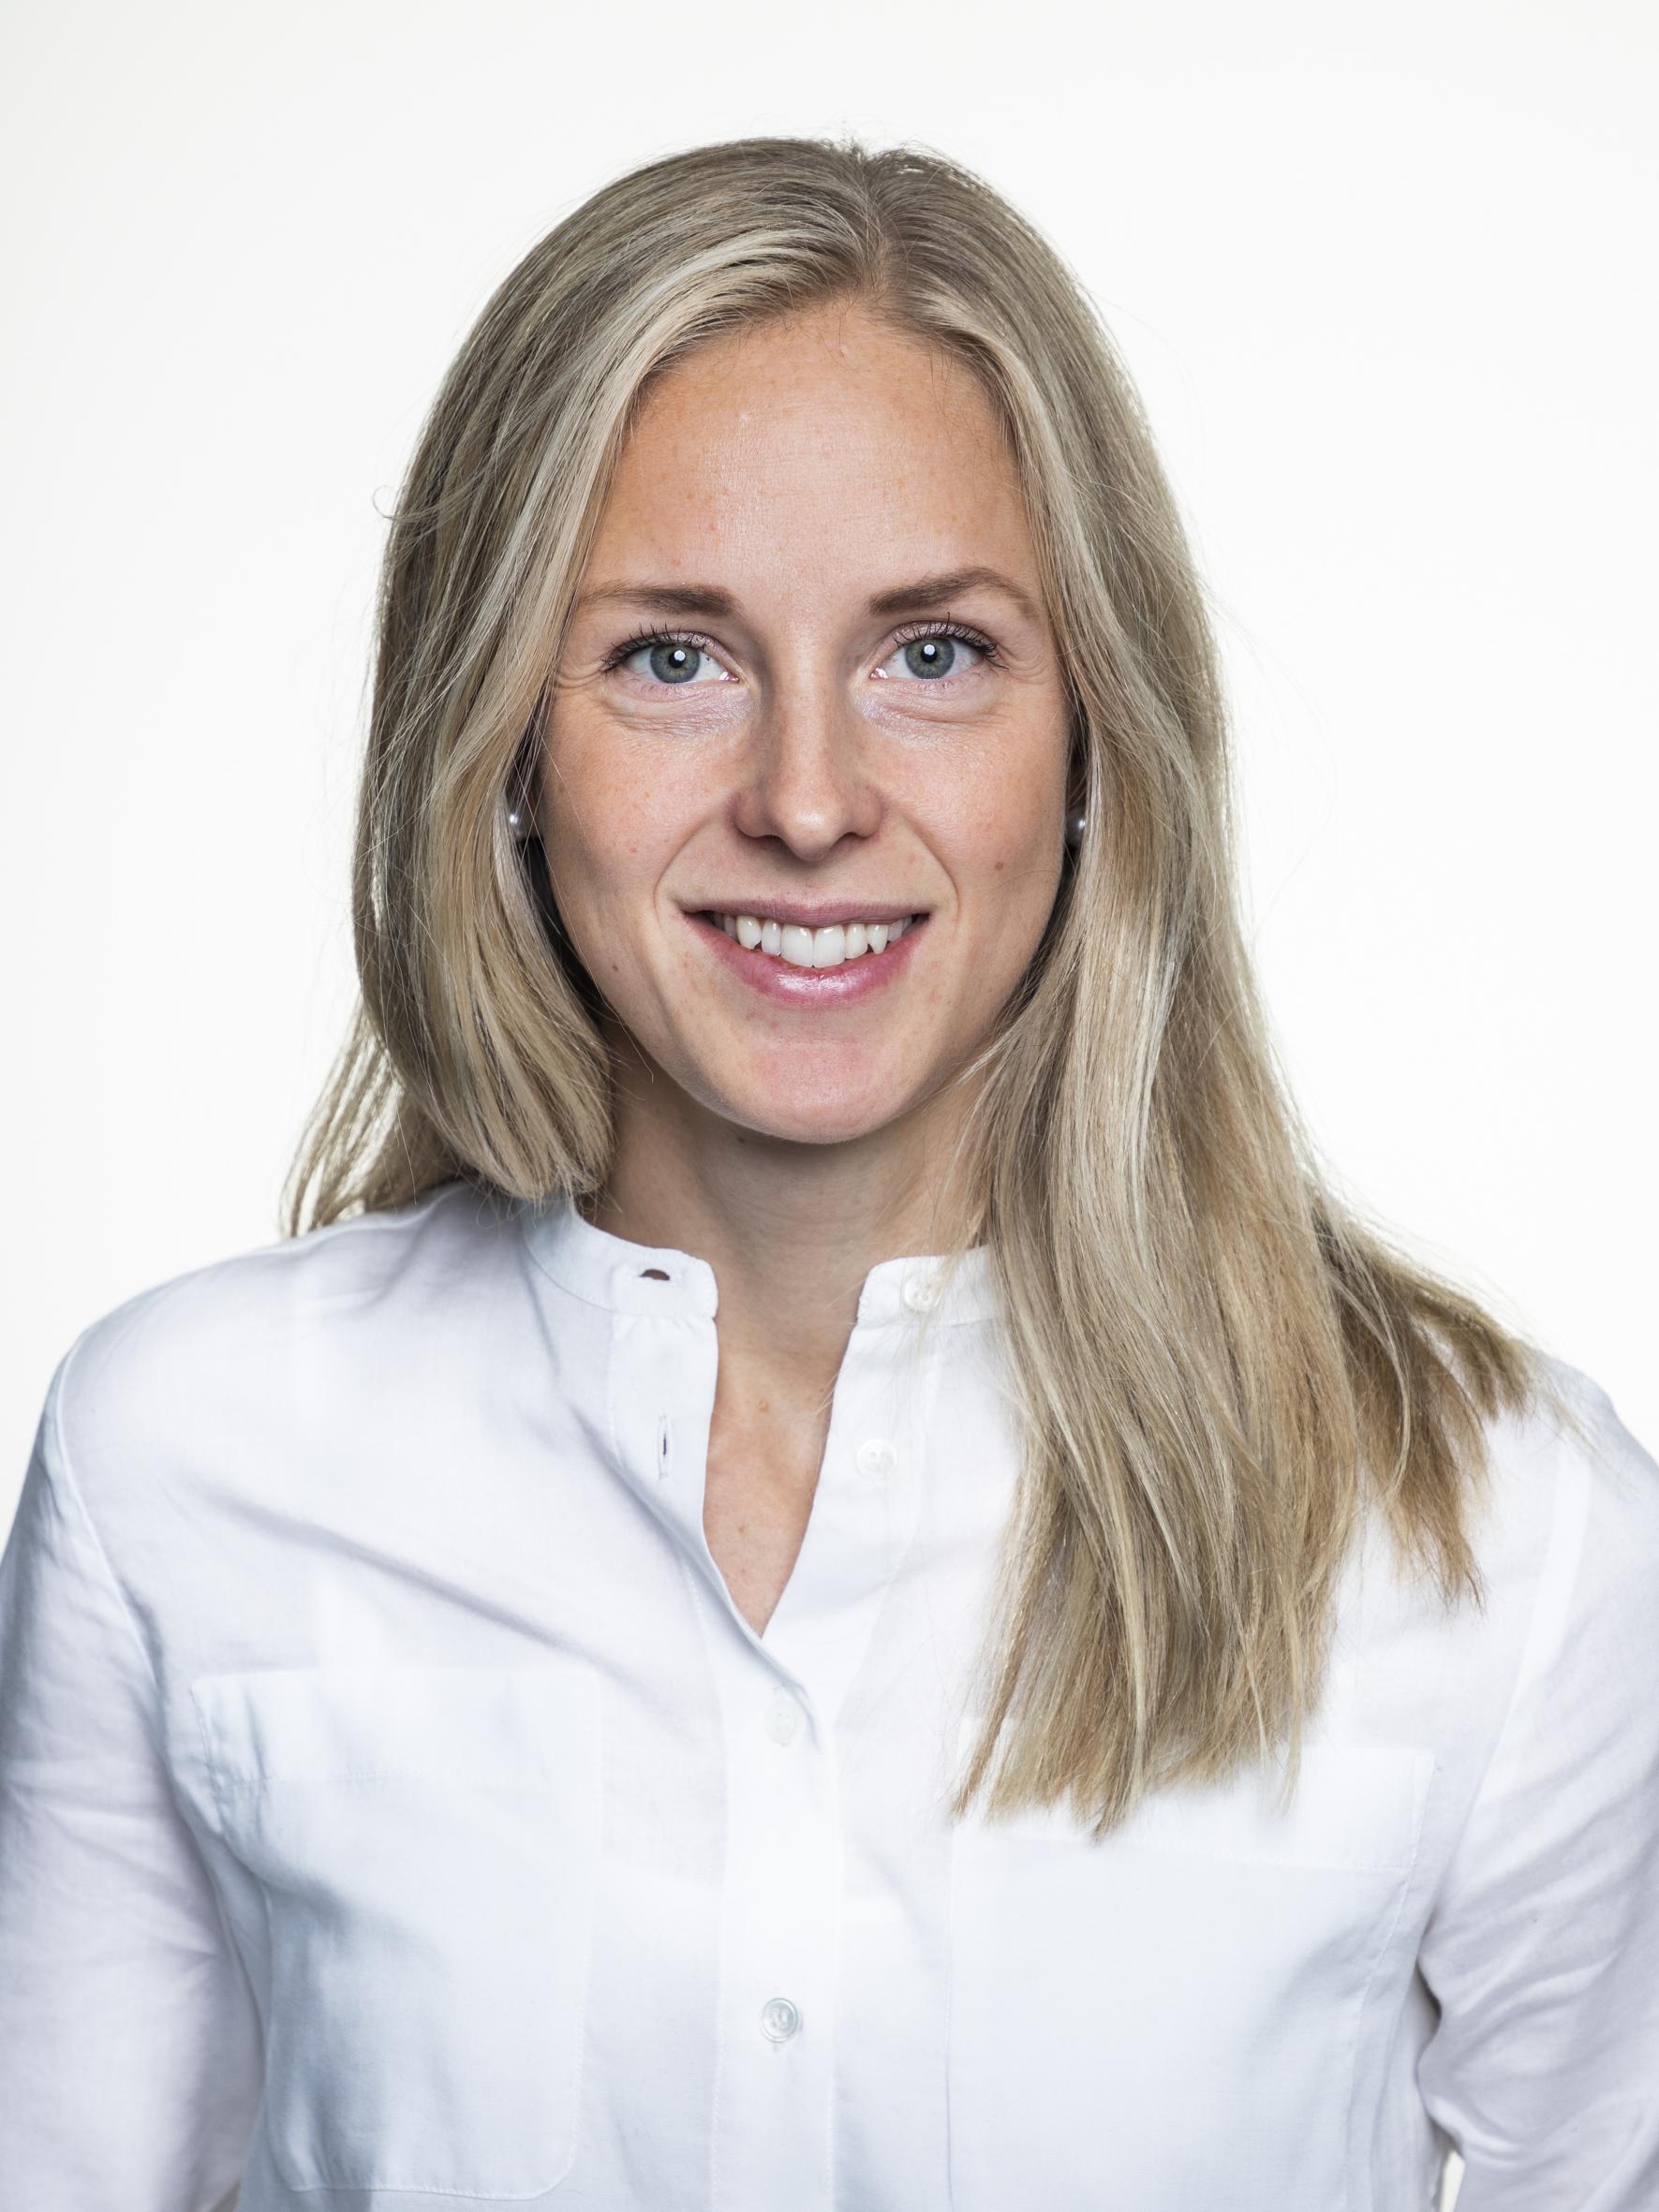 Rosalie Sandahl